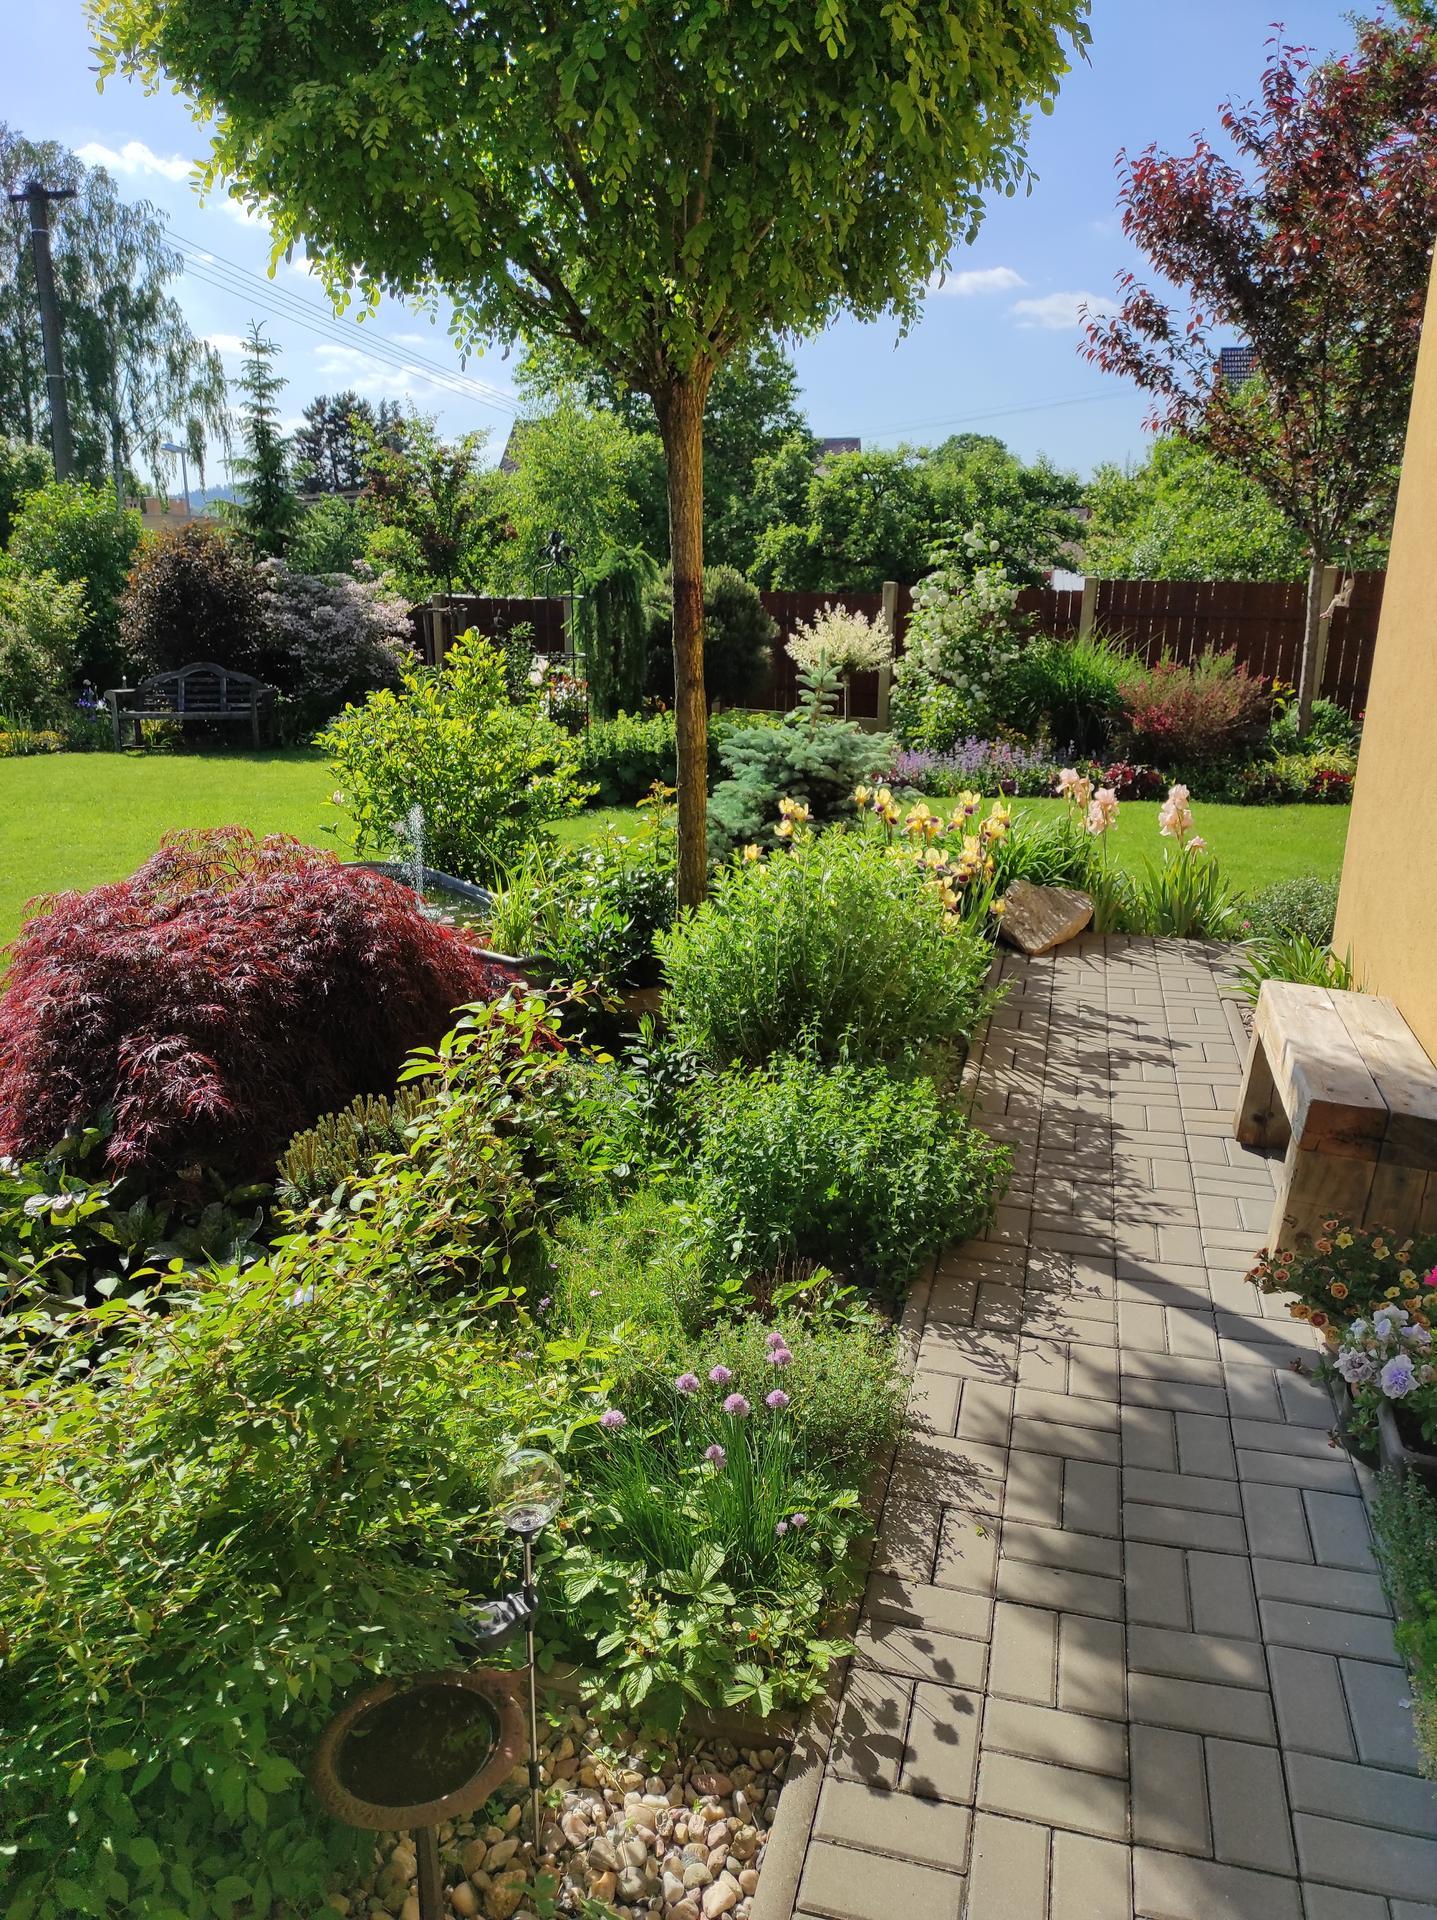 Zahrada 2021 - Obrázek č. 42